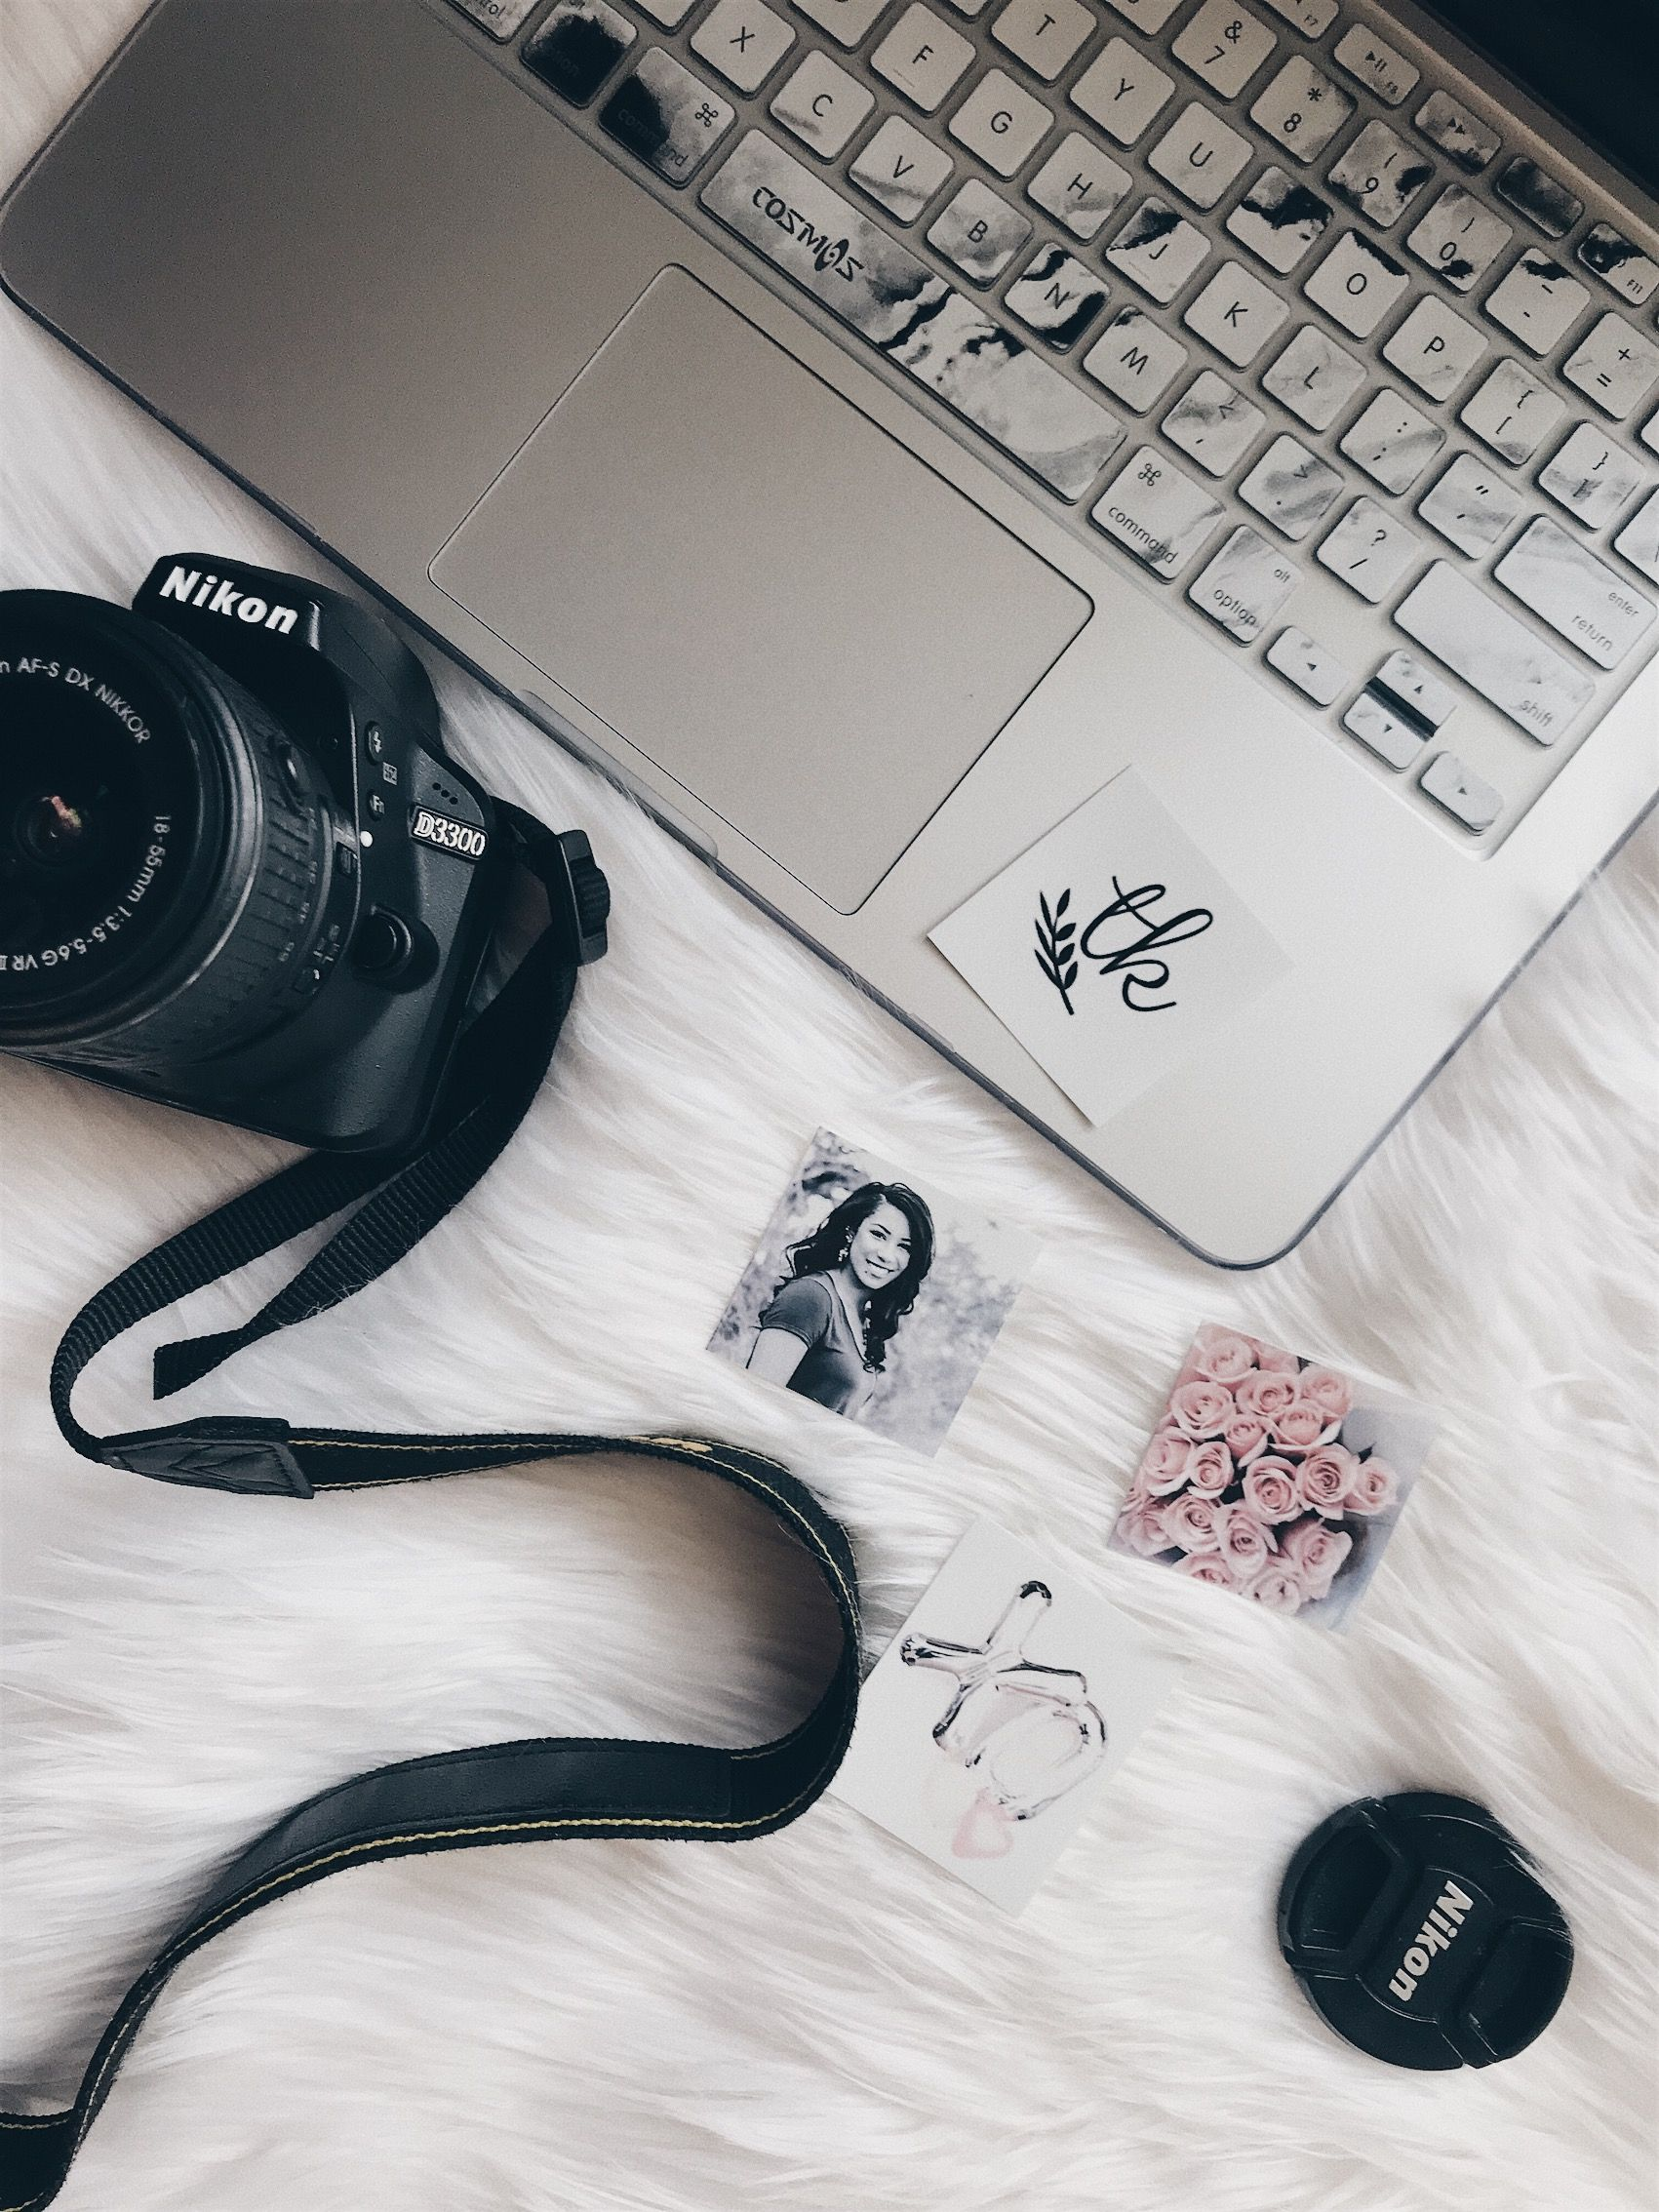 Flat lay photography fur rug Nikon D3300 MacBook iPhone photography vscocam Blogging 101 Pinterest